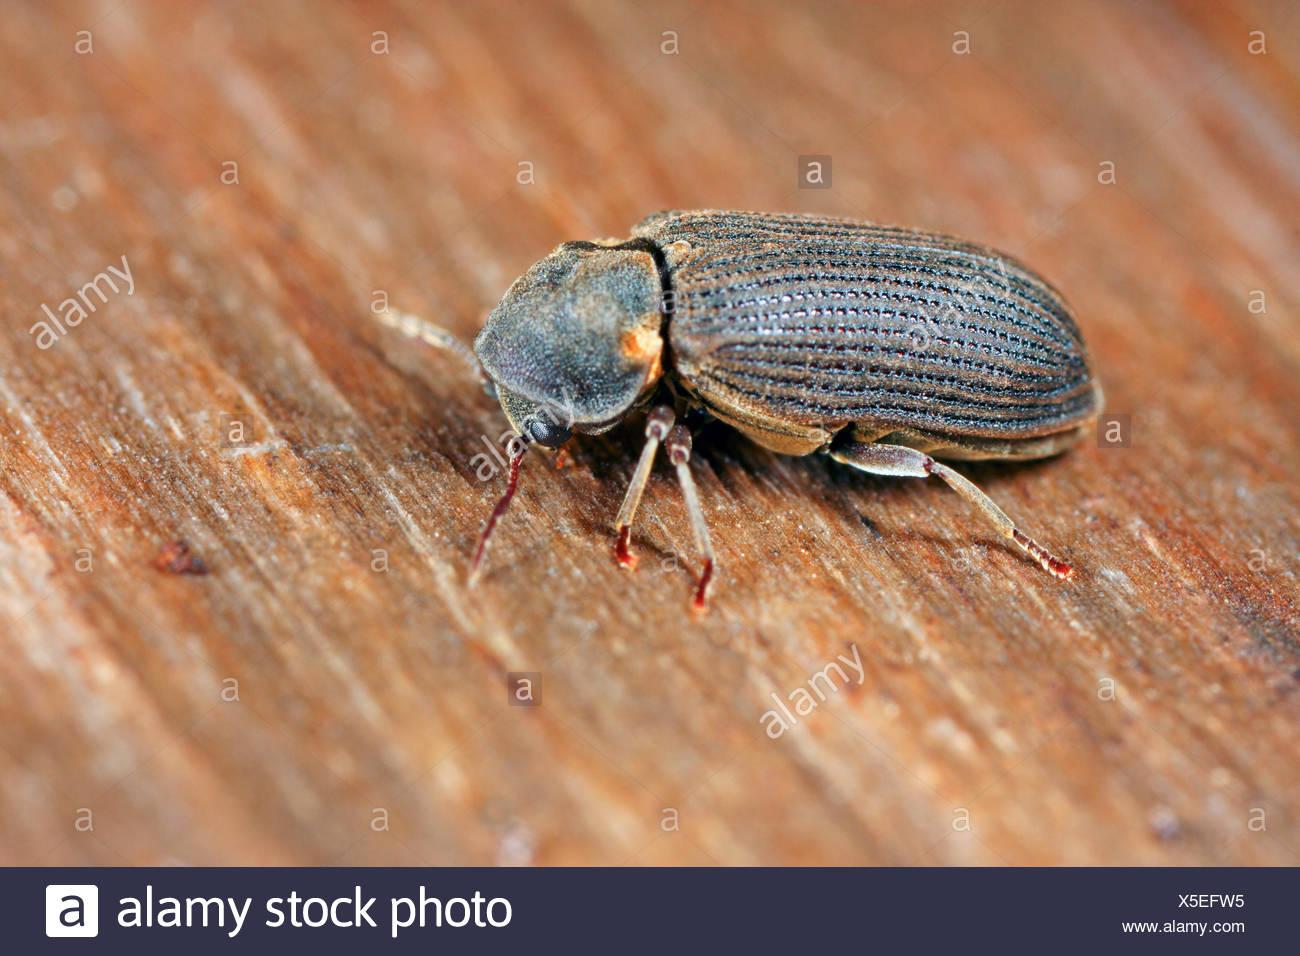 furniture-beetle-woodworm-woodboring-beetle-anobium-spec-woodworm-on-wood-X5EFW5.jpg